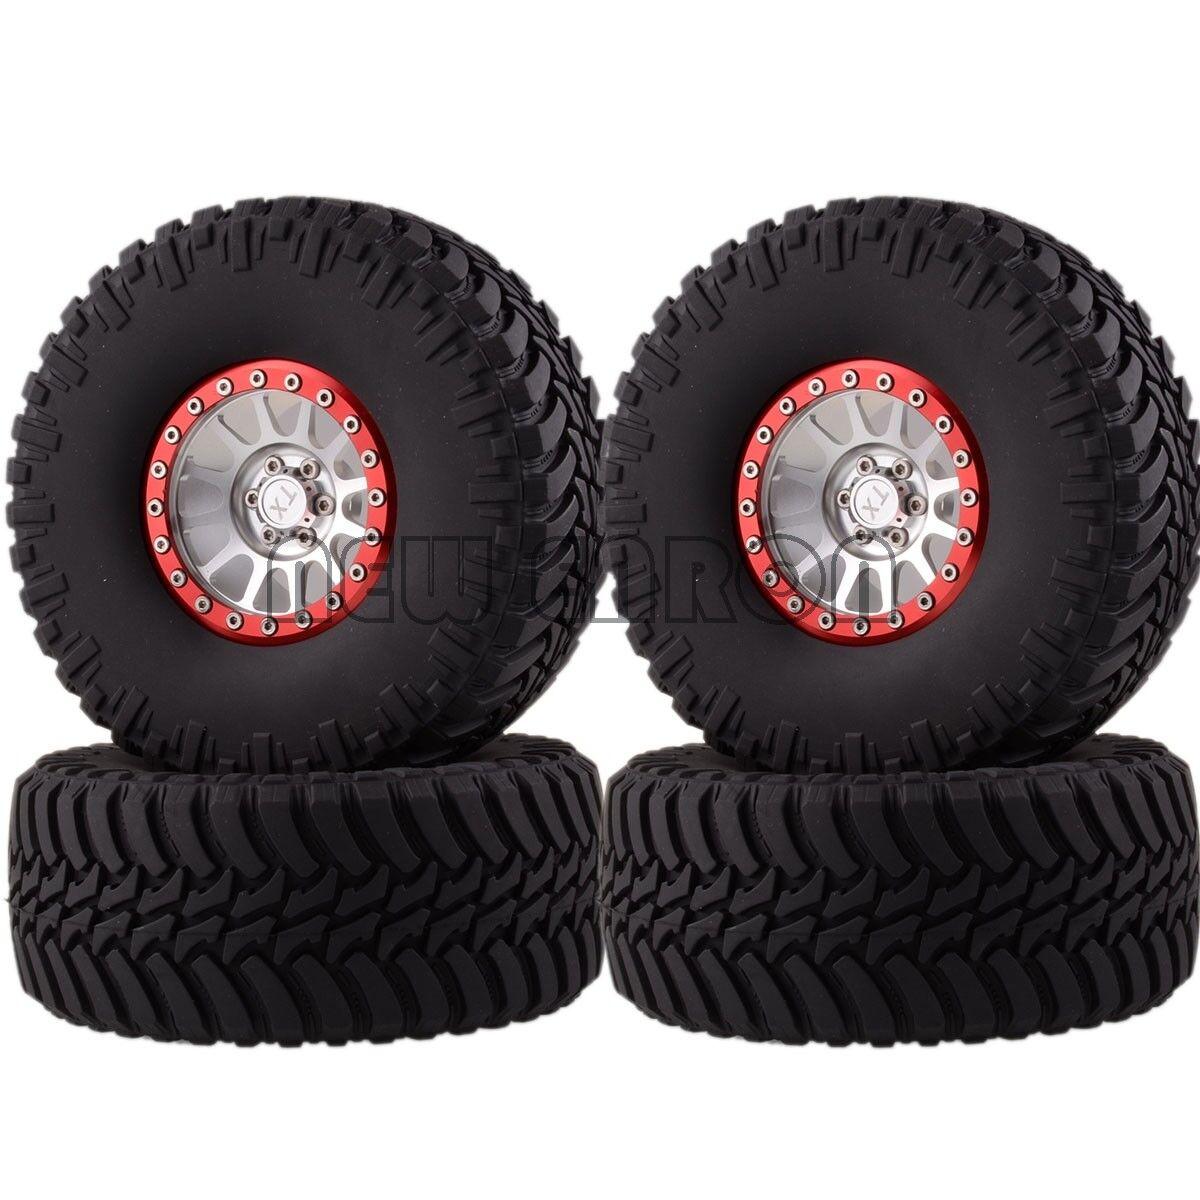 Plata-Rojo De Aluminio 2.2  mm Wheels & Super Swamper Neumáticos para 1 10 Crawler